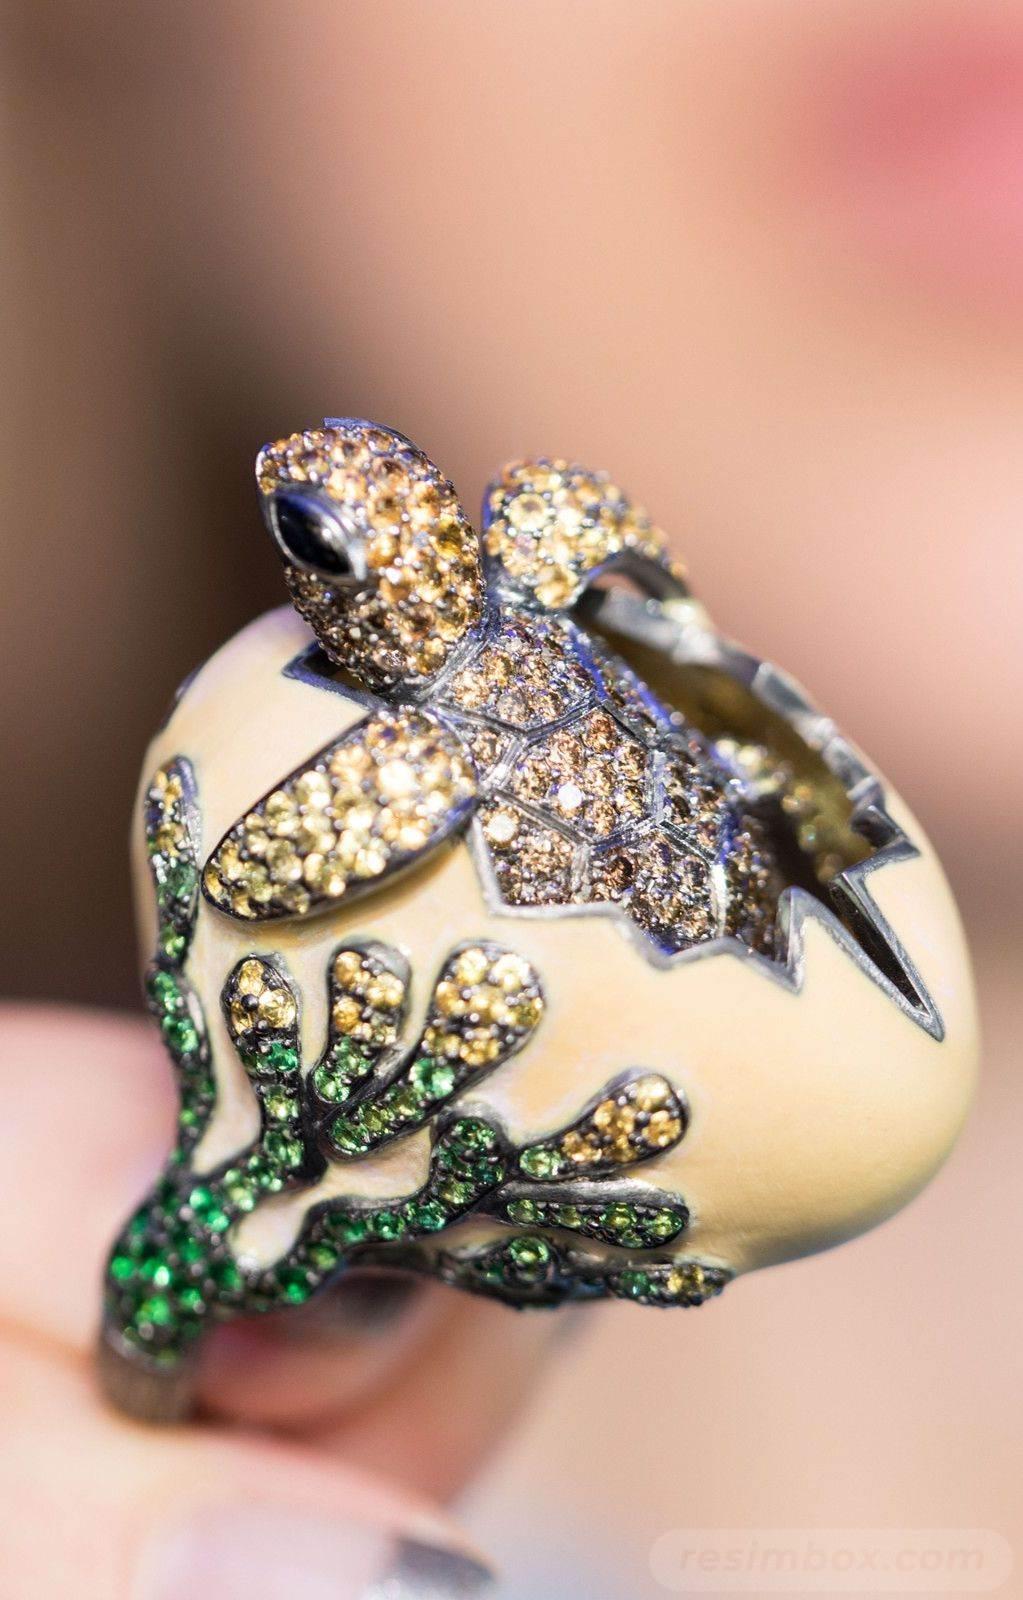 gemologue-animal-jewelry-curation-141652350766168885